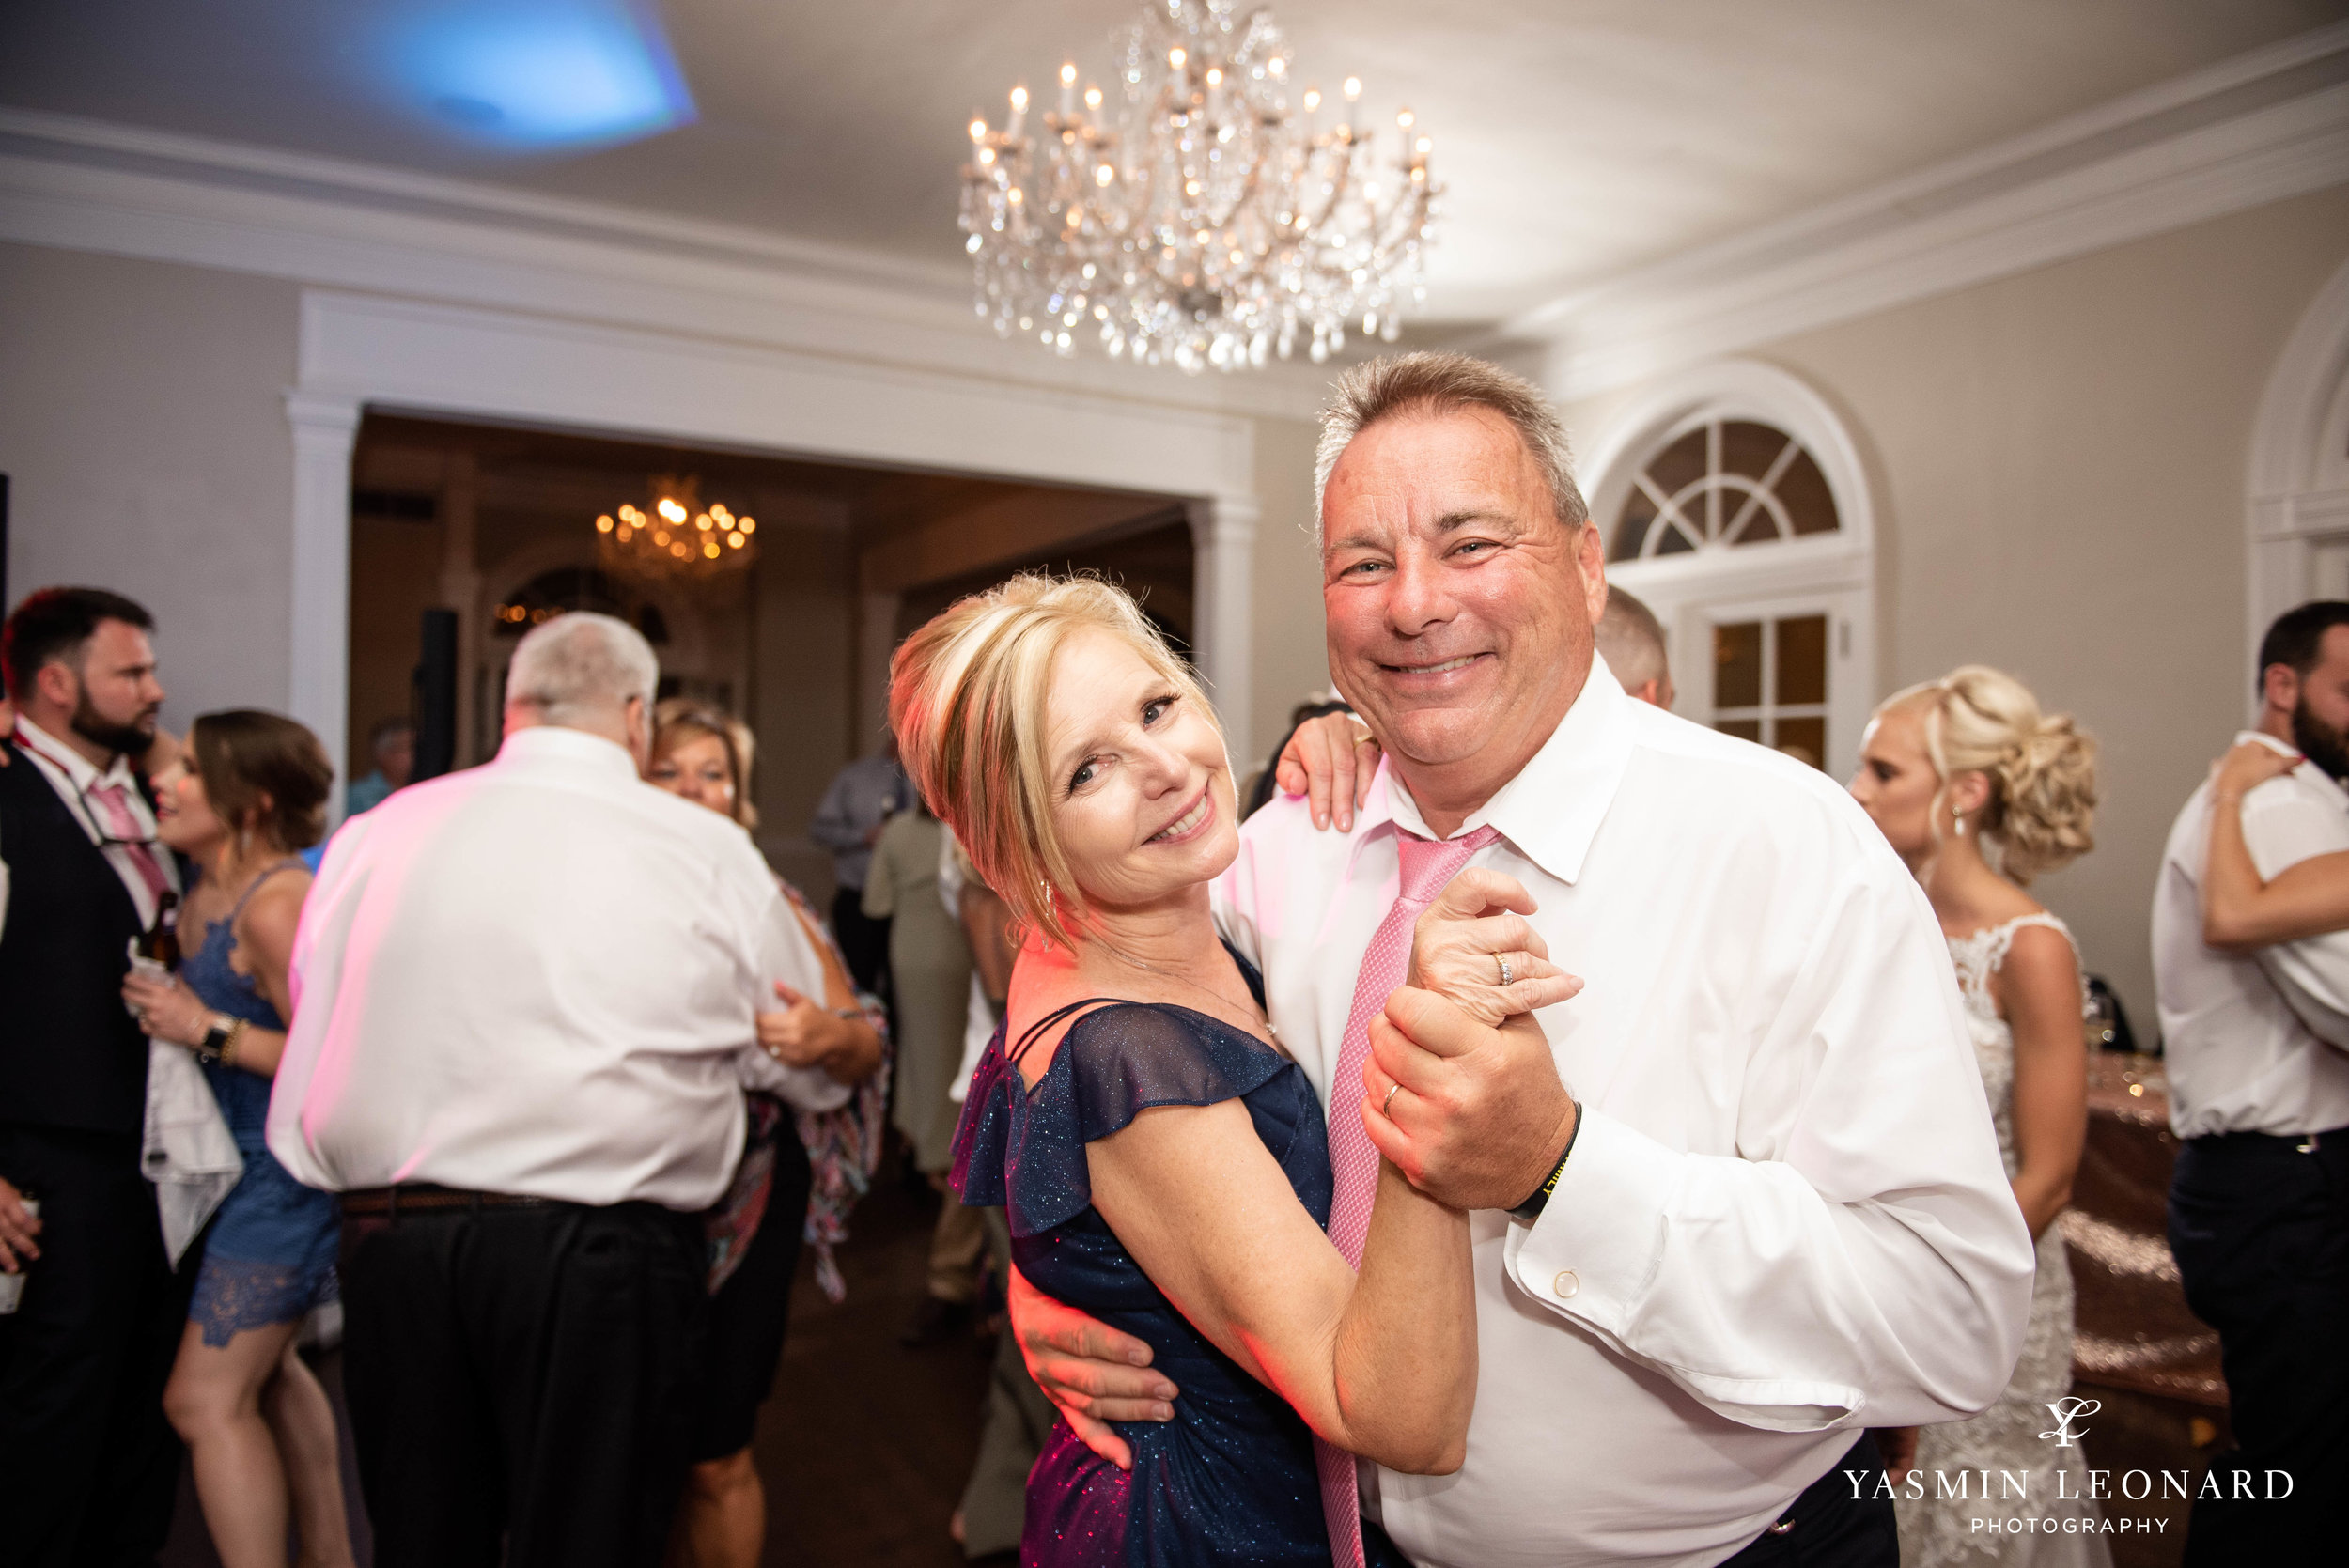 Separk Mansion - NC Weddings - Gastonia Wedding - NC Wedding Venues - Pink and Blue Wedding Ideas - Pink Bridesmaid Dresses - Yasmin Leonard Photography-64.jpg